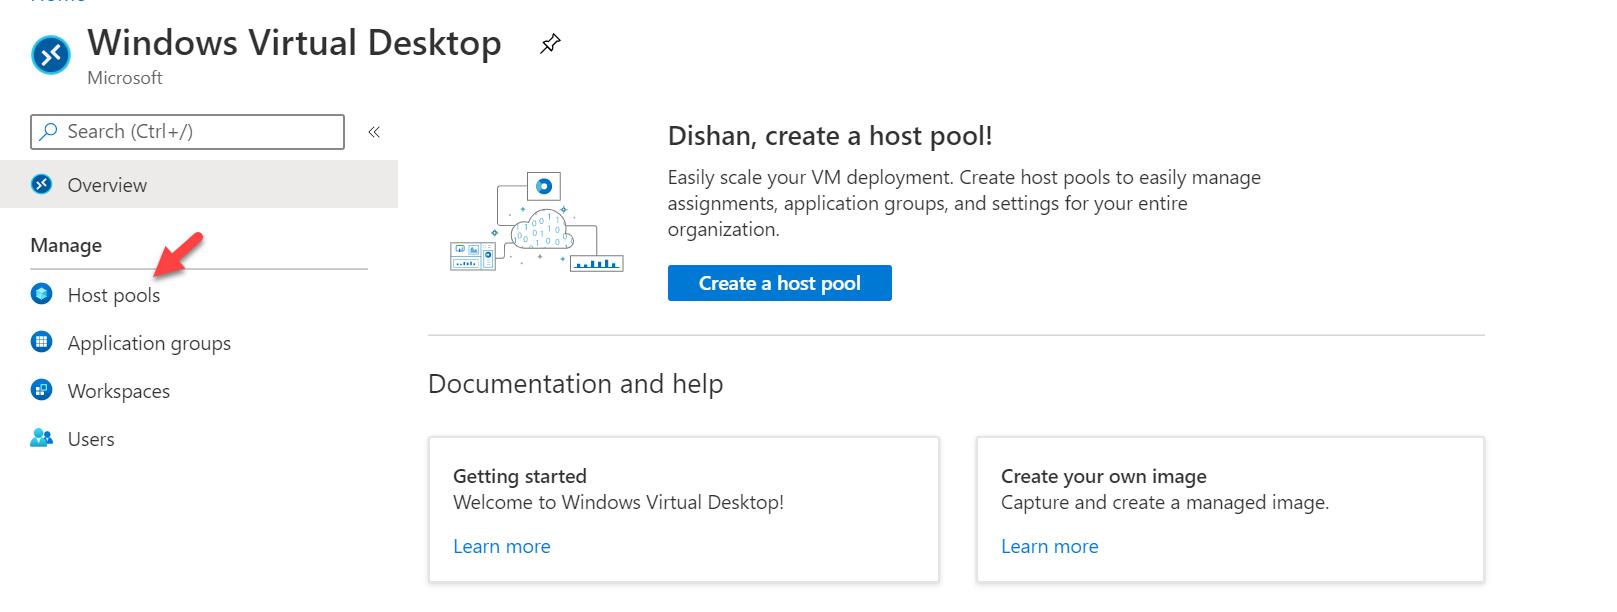 Windows Virtual Desktop host pools